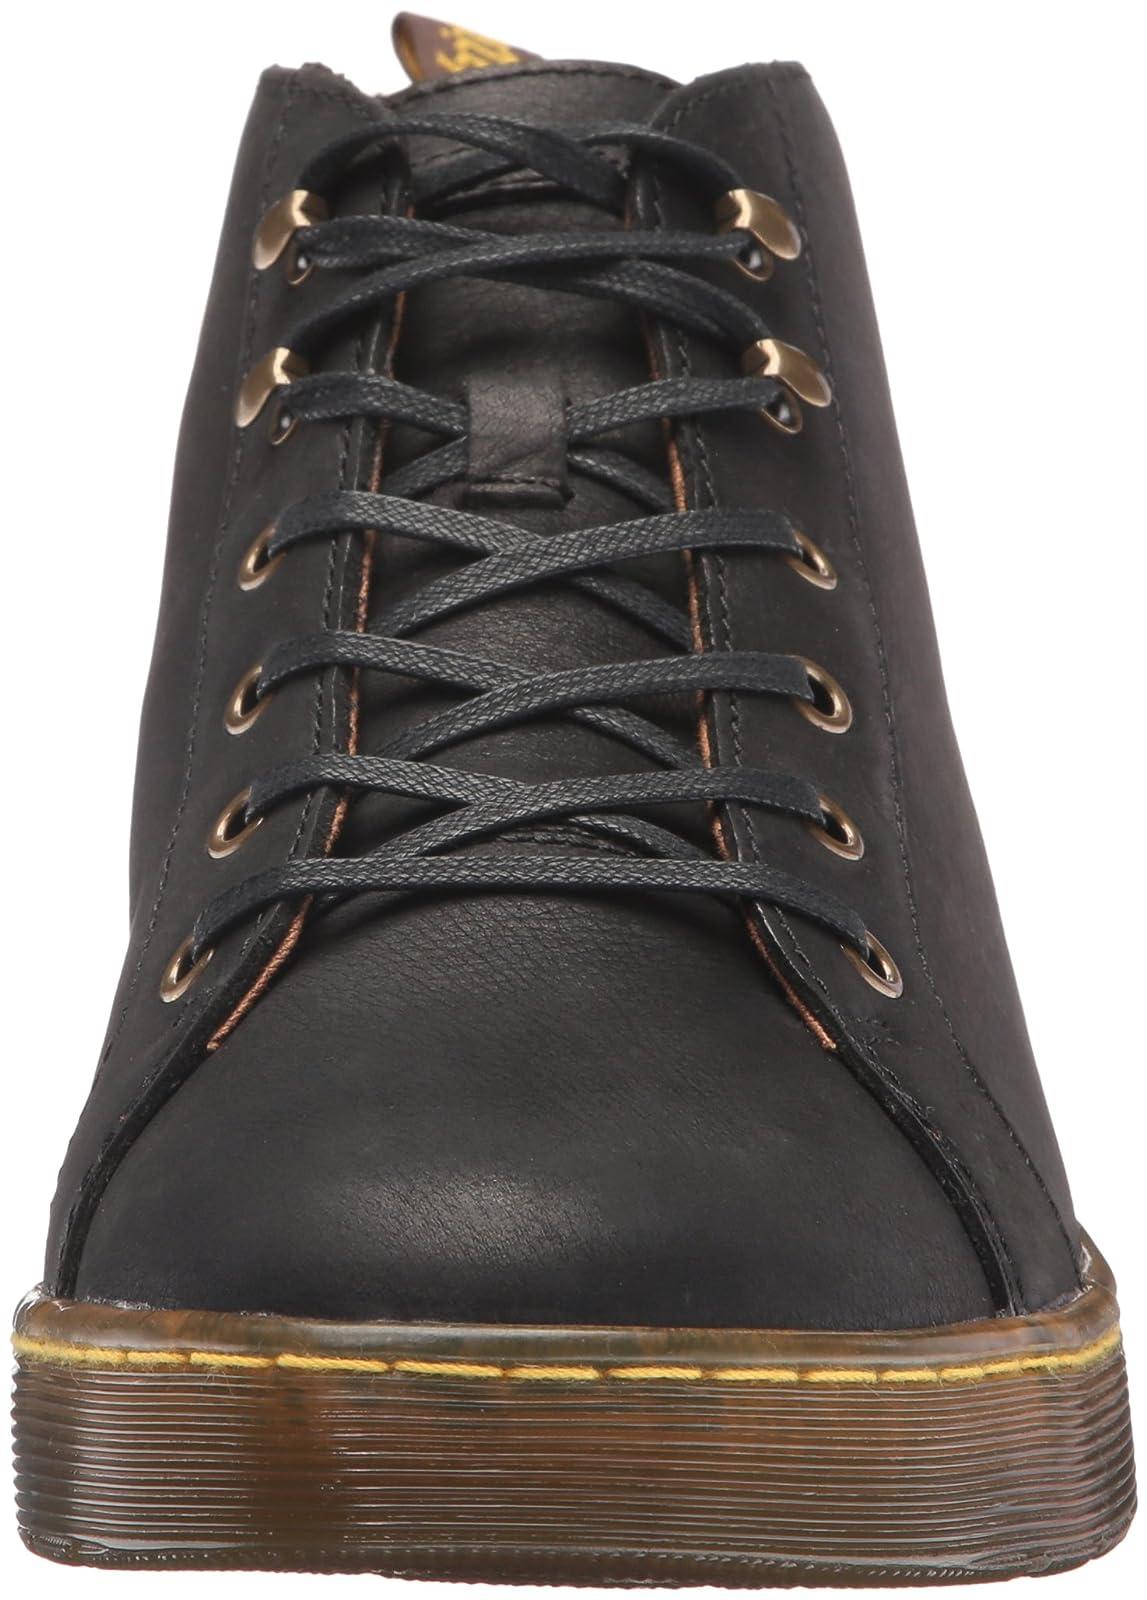 Dr. Martens Men's Coburg Wyoming Chukka Boot 9 M US - 4